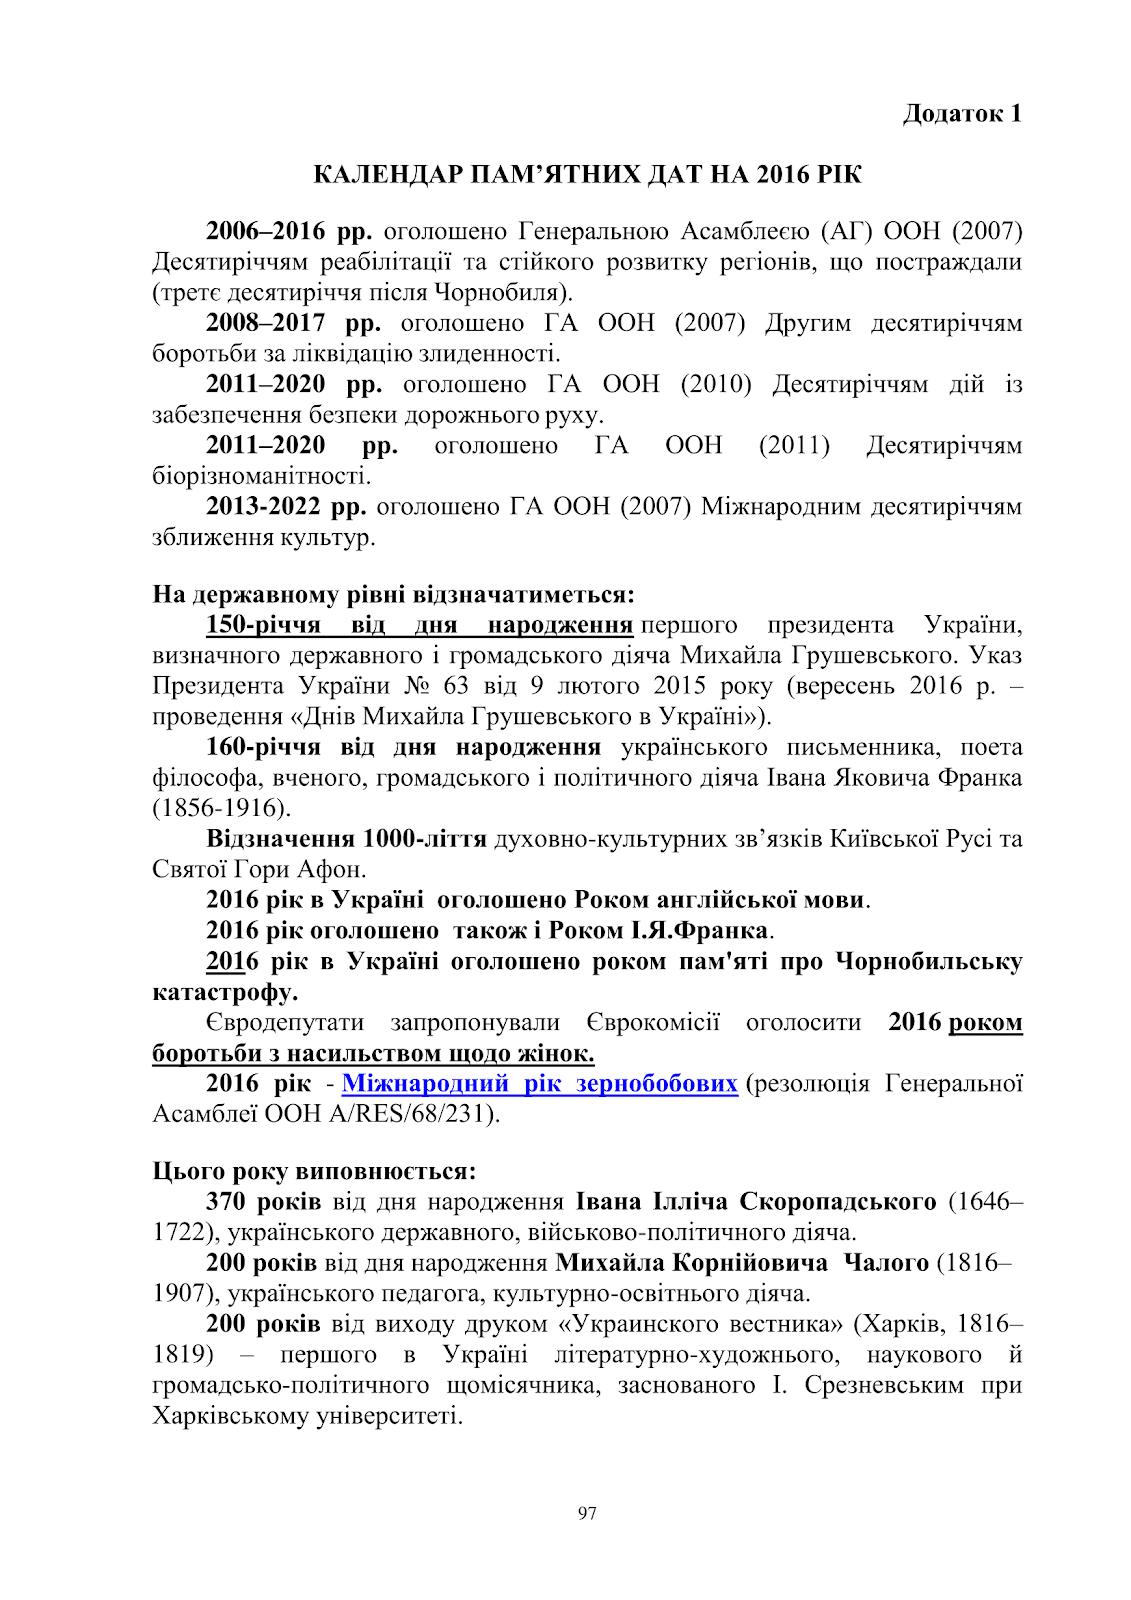 C:\Users\Валерия\Desktop\план 2016 рік\план 2016 рік-097.png